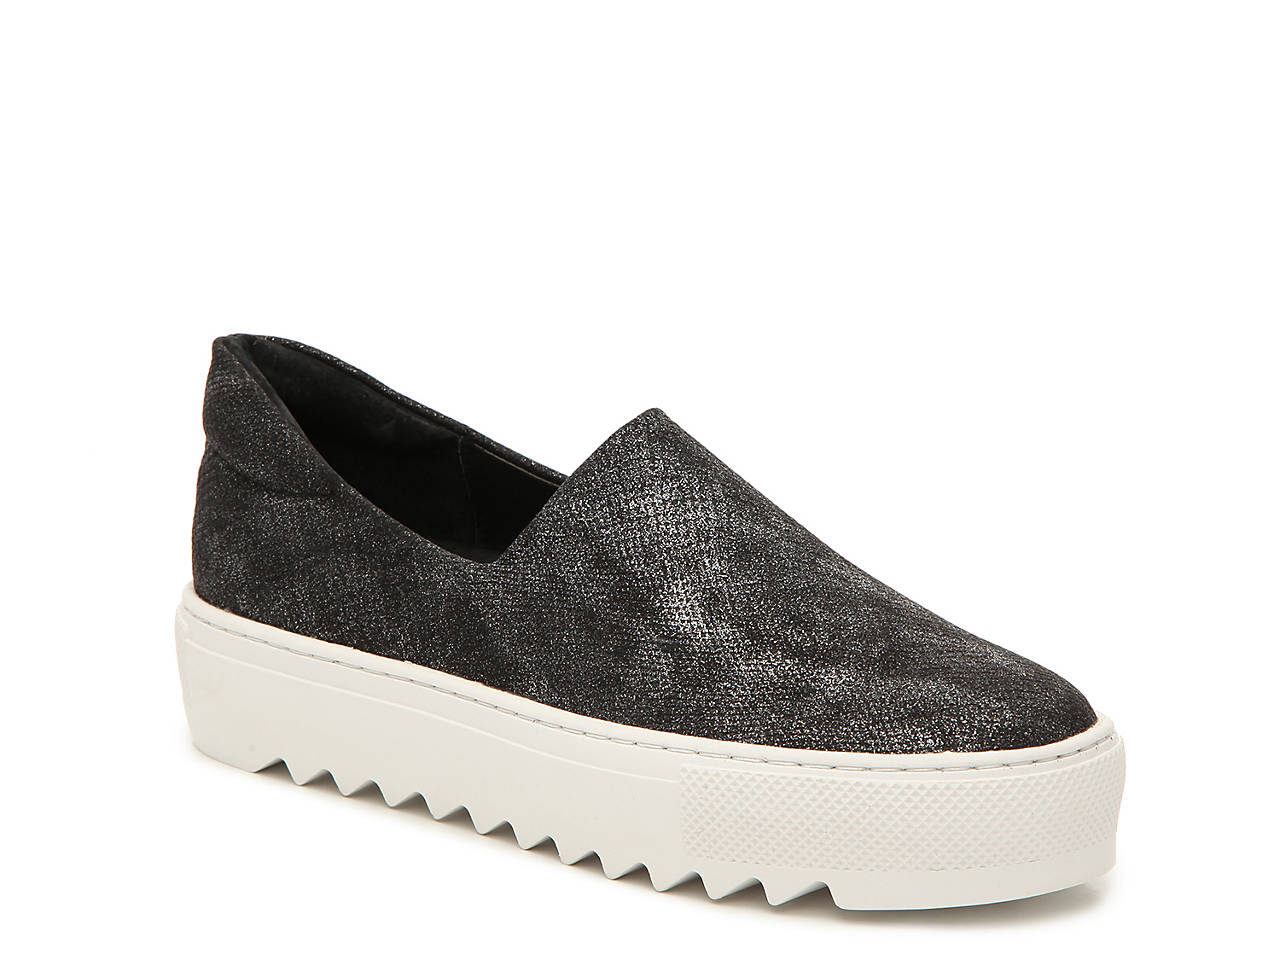 3ced030f8 J Slides Sage Slip-On Sneaker Women's Shoes   DSW